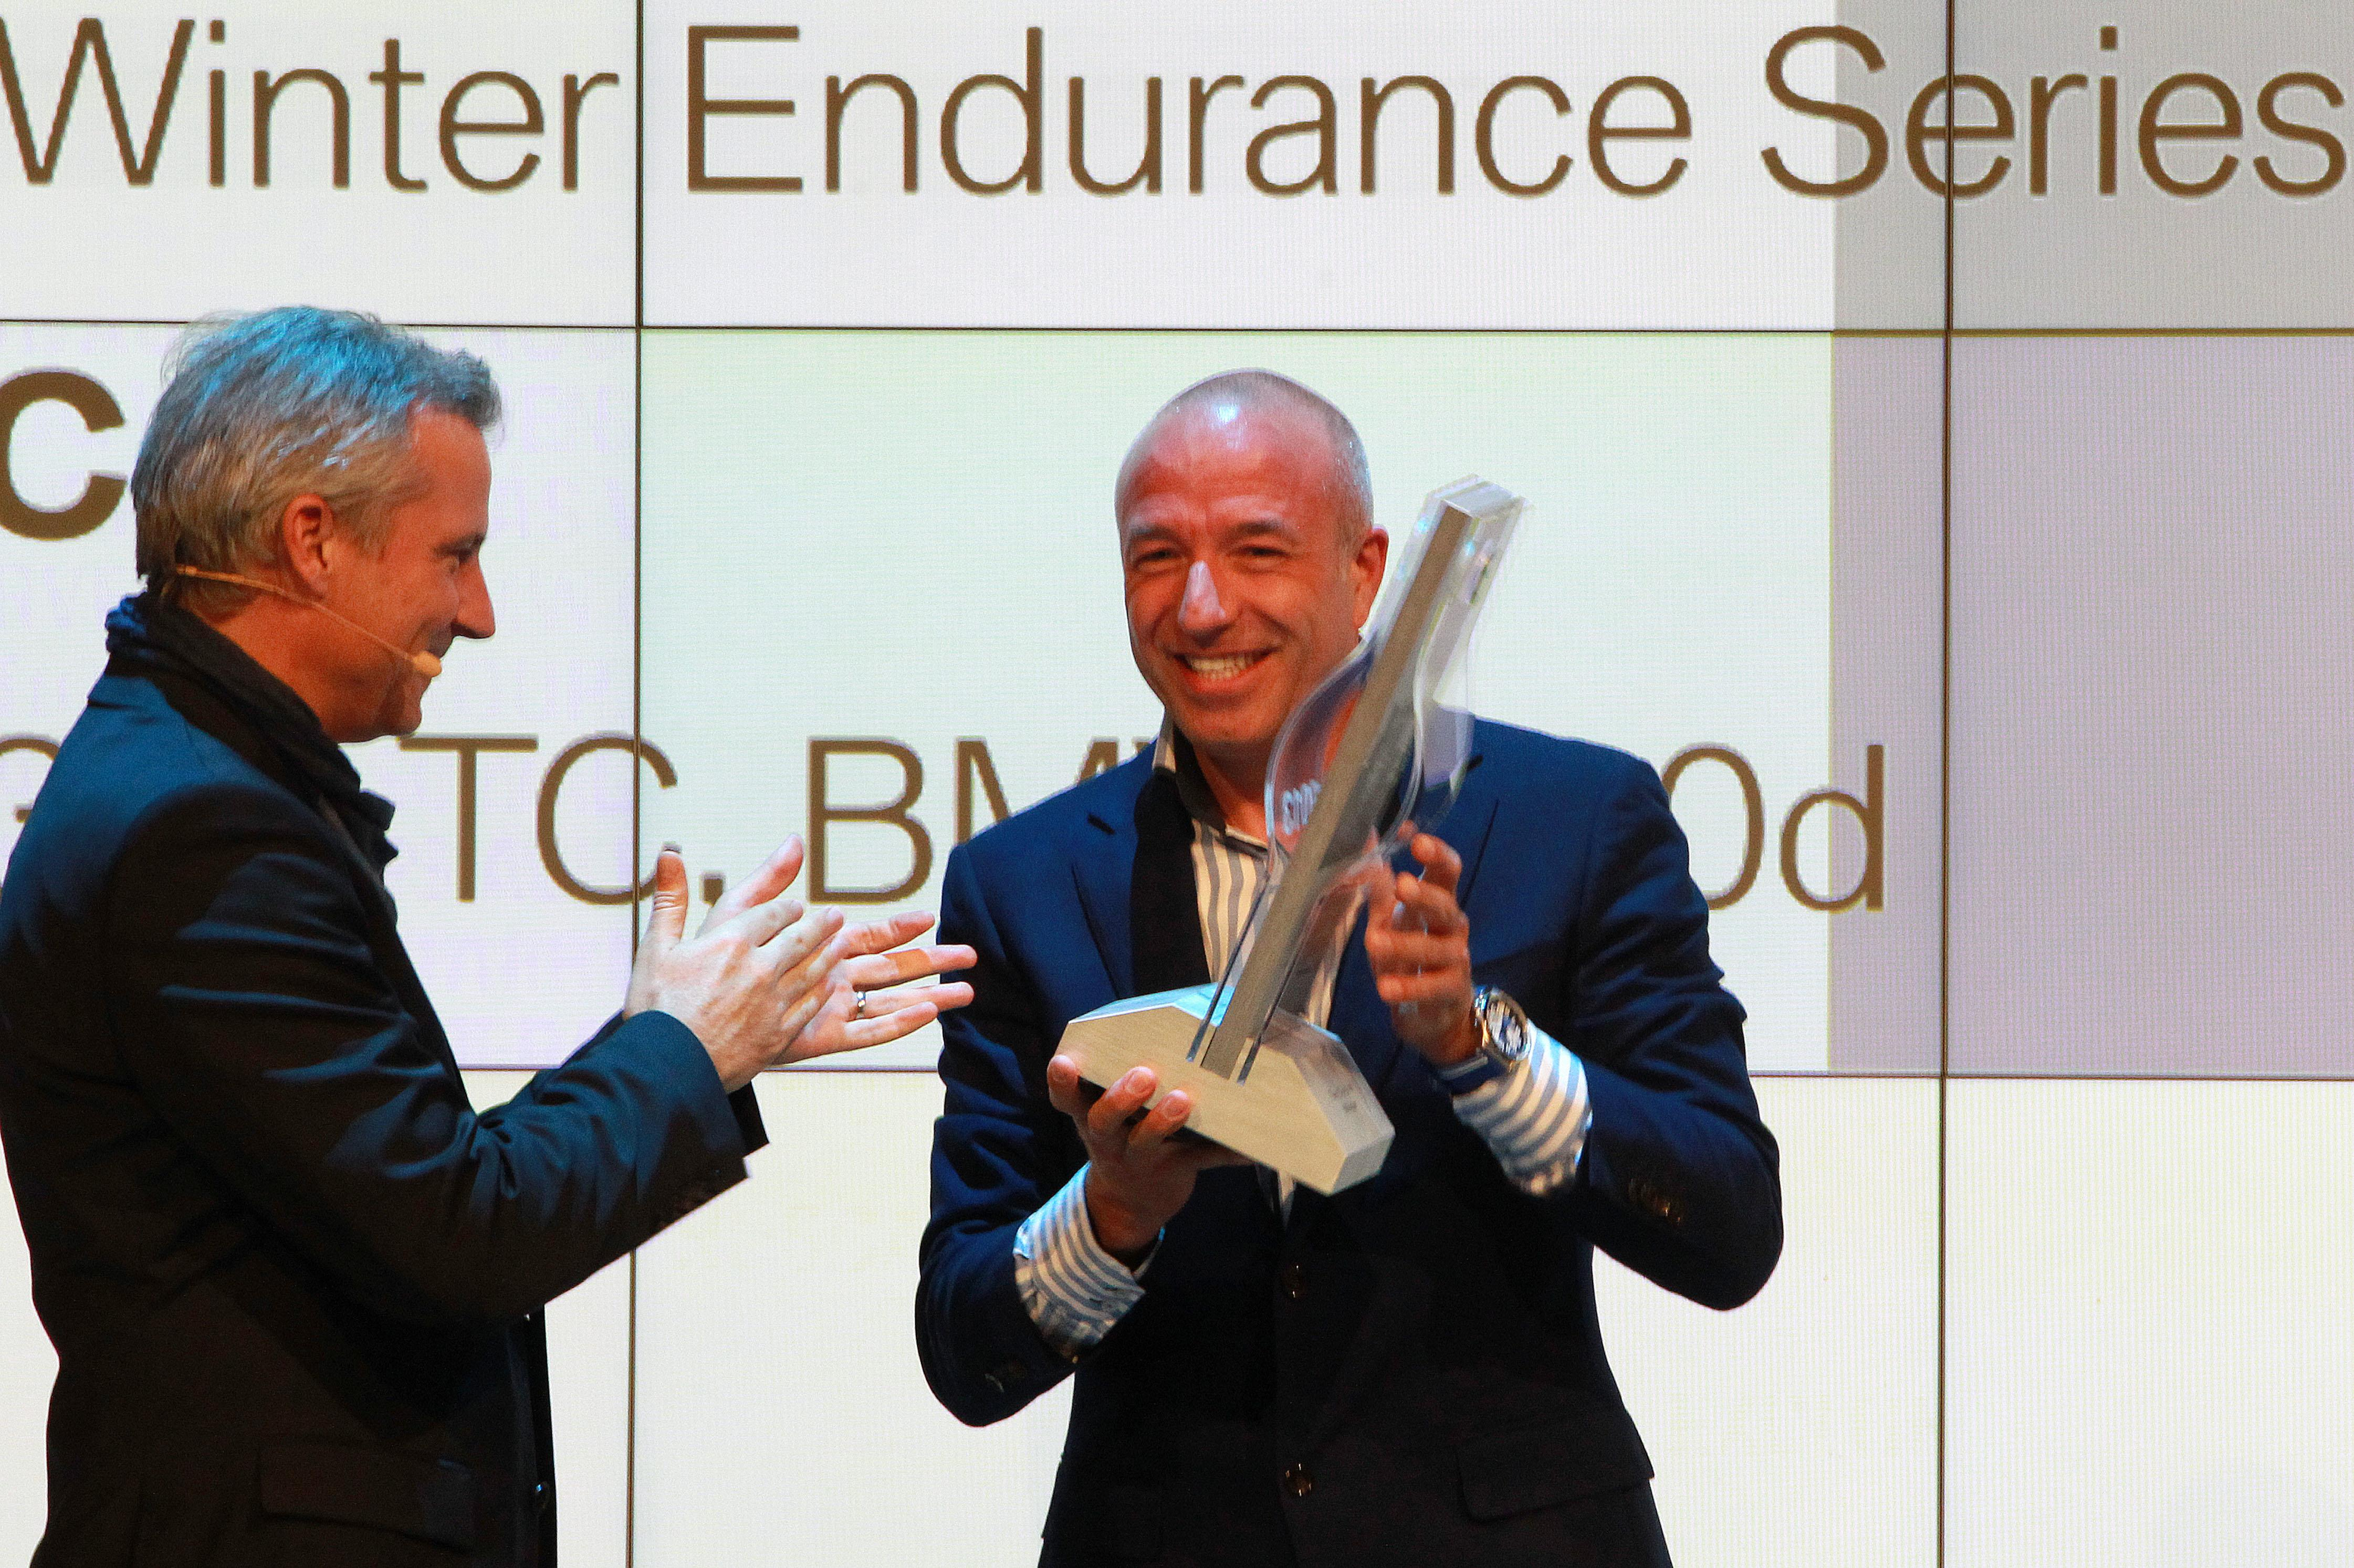 Tom receiving his well-deserved trophy from Herr Marquardt (Credit: BMW Motorsport)